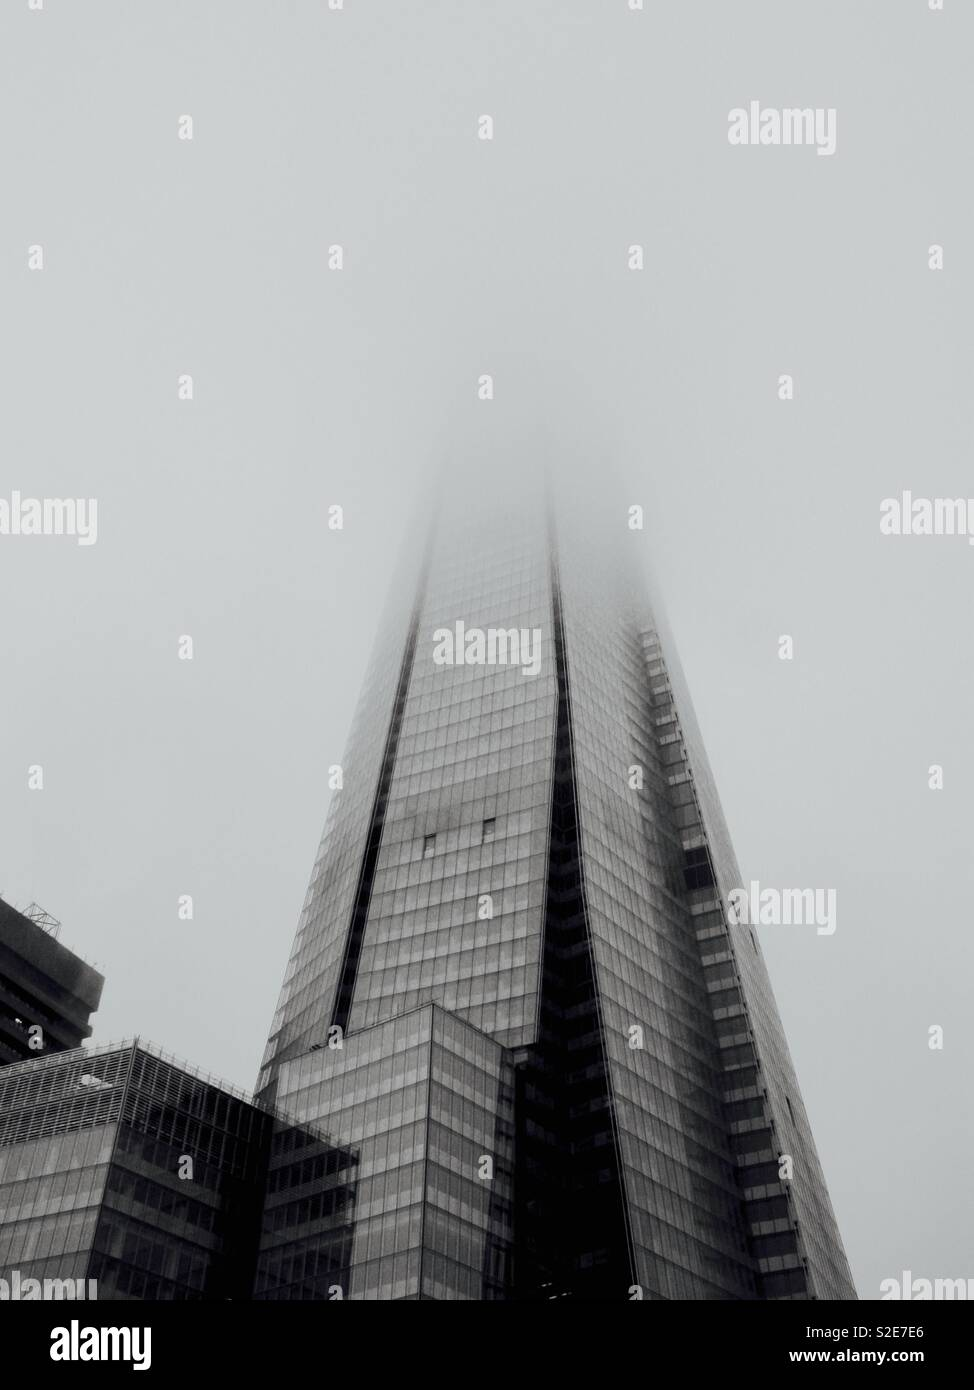 La shard avvolta nella nebbia Foto Stock